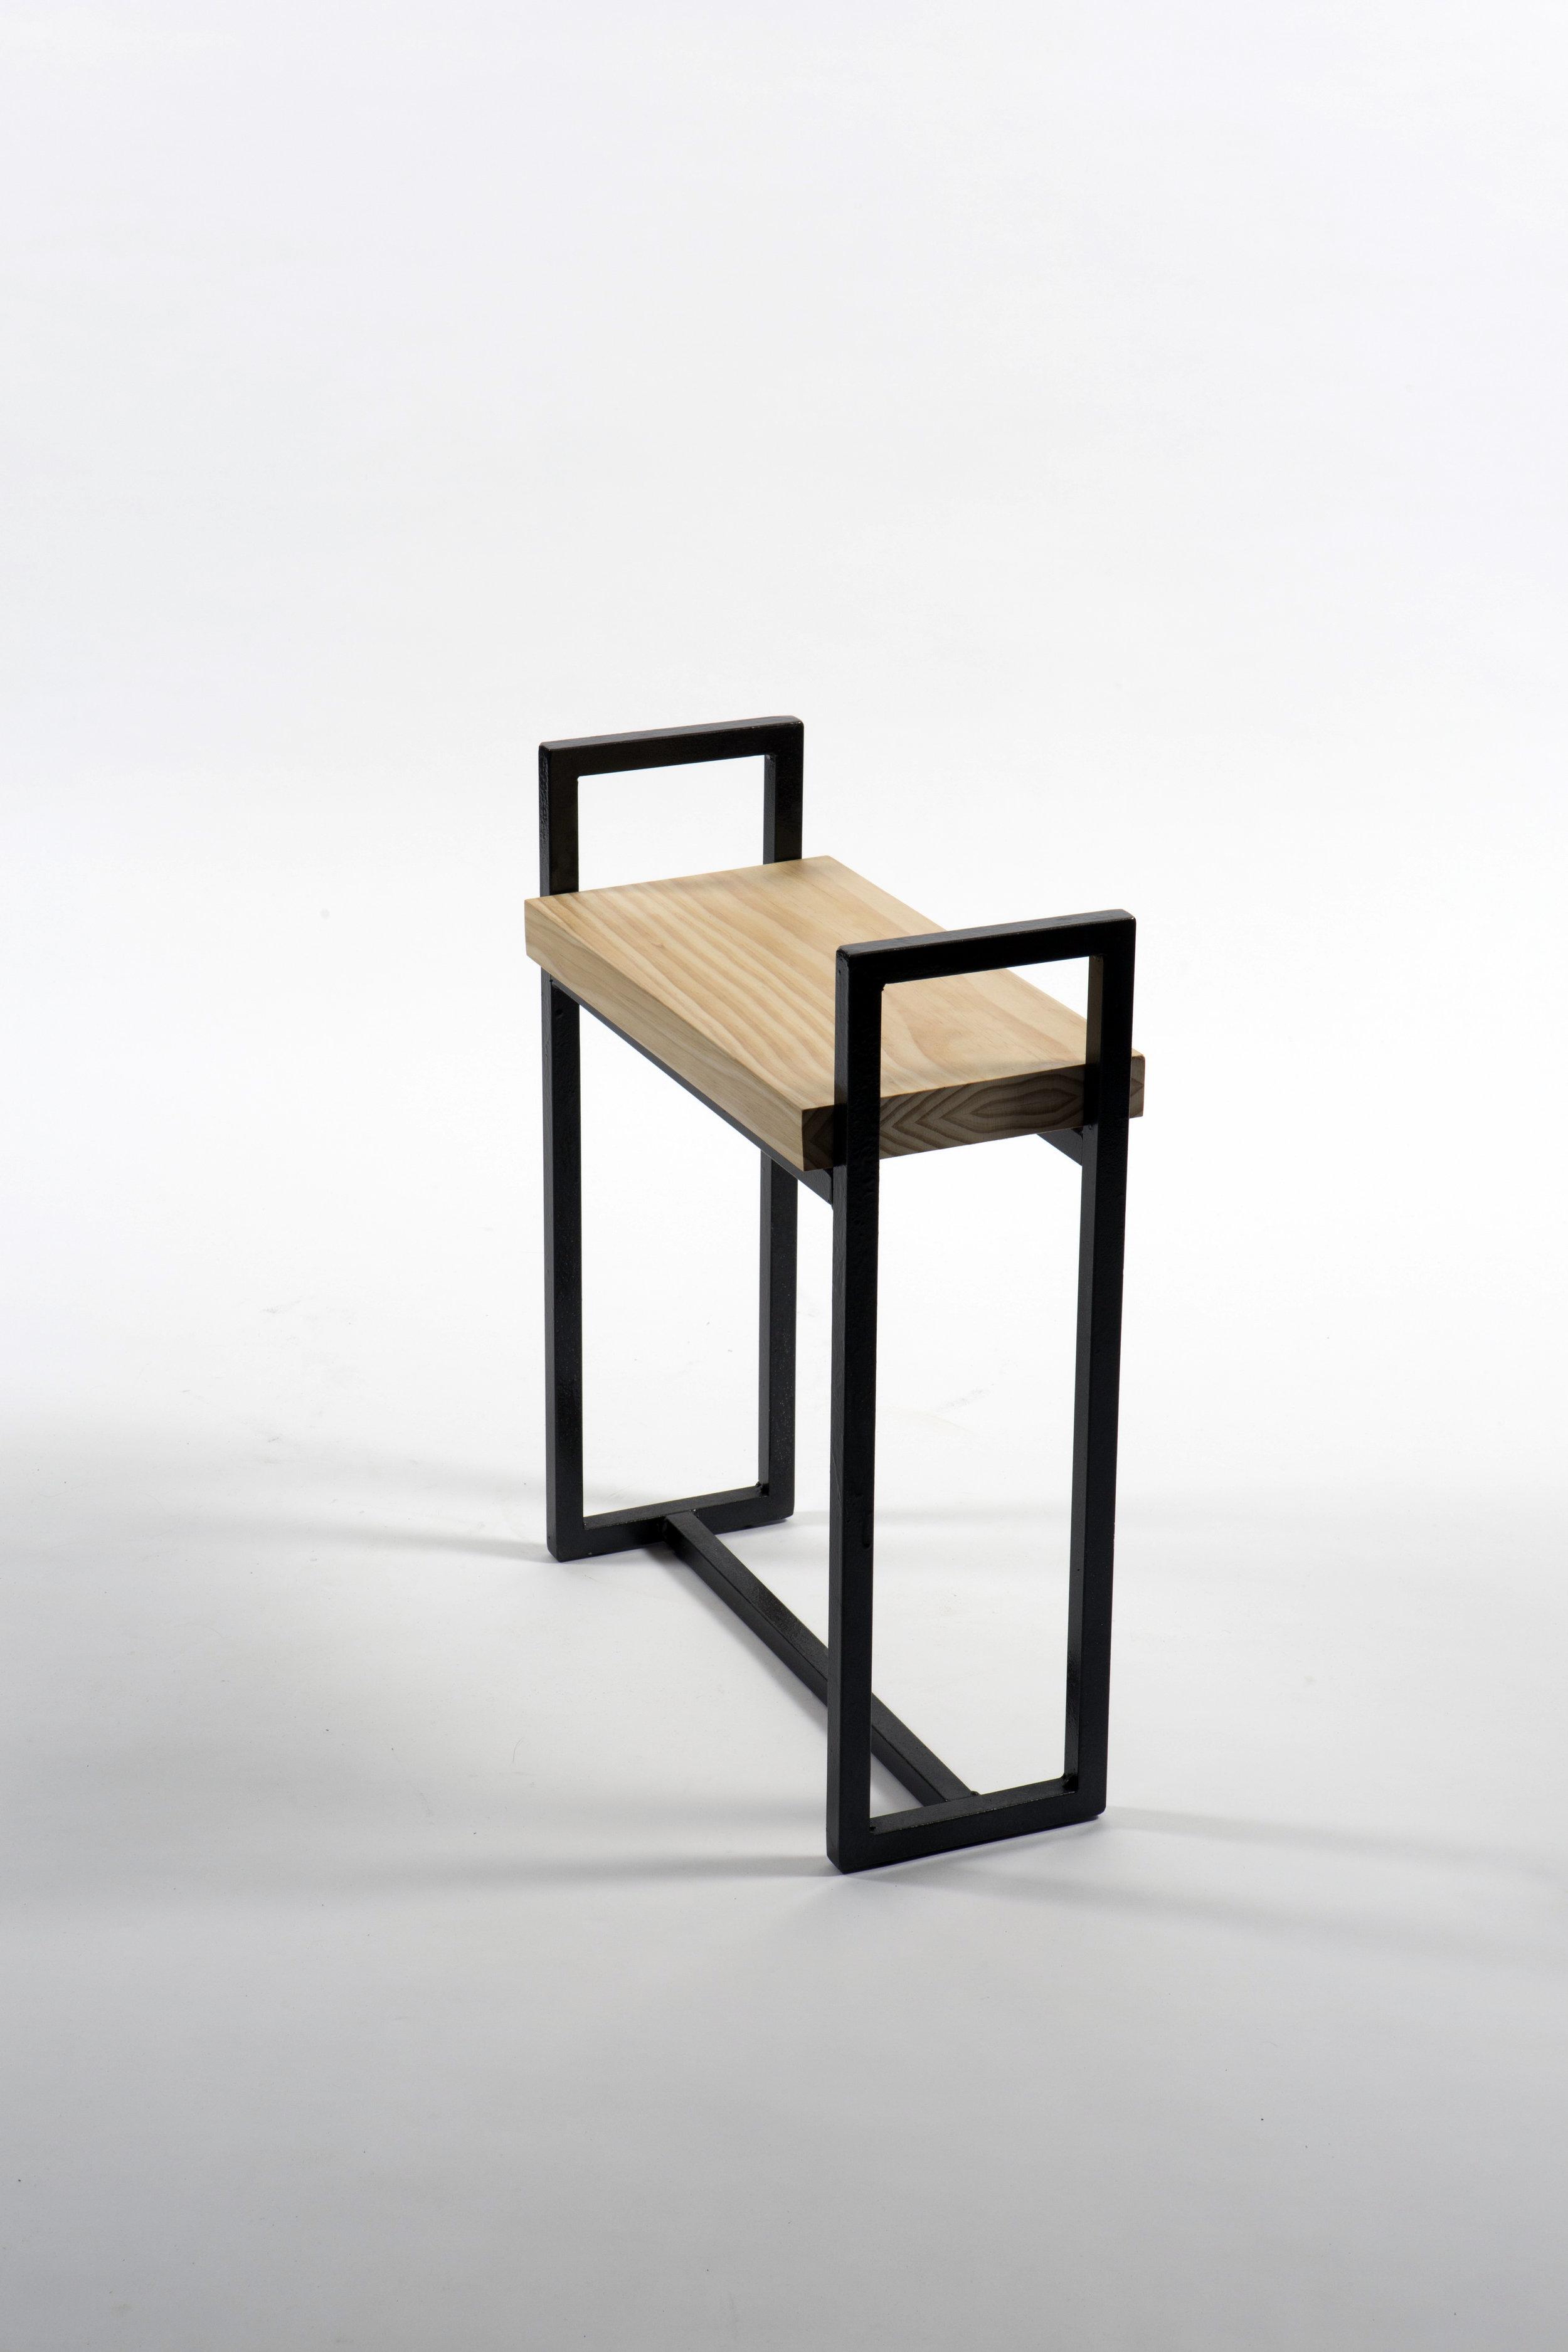 stoolpic3.jpg